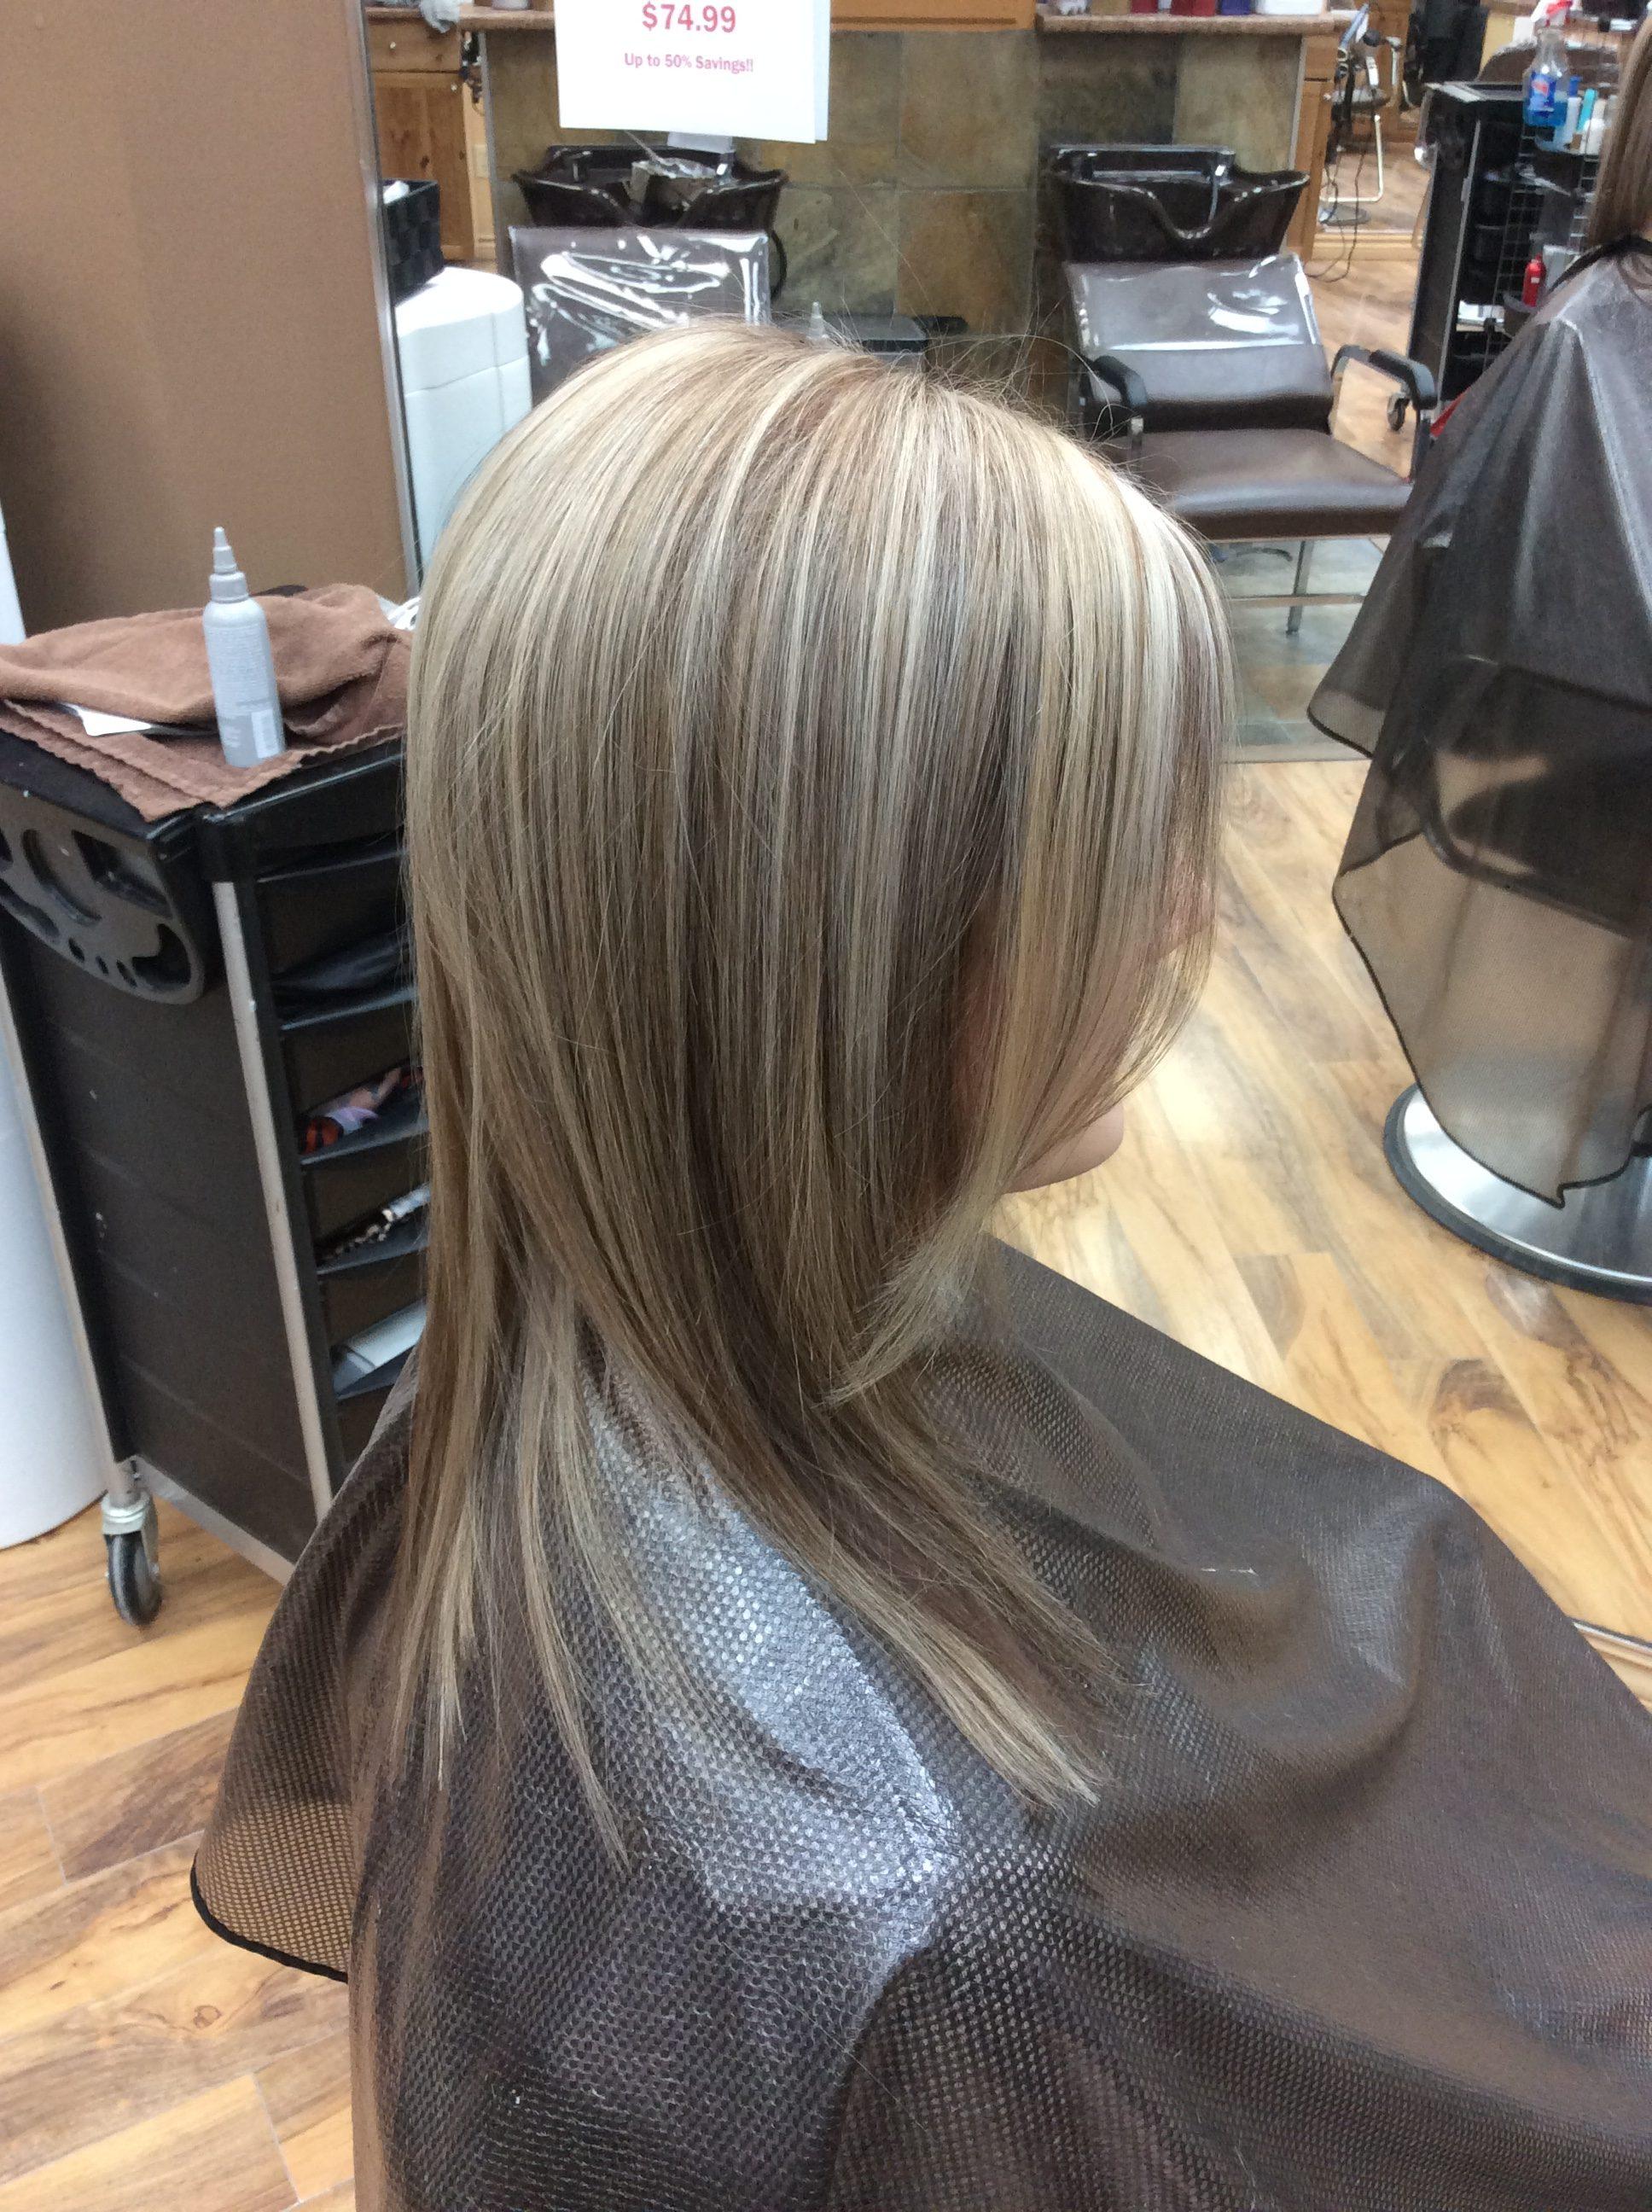 Blonde brunette hair at hairstyle inn saskatoon